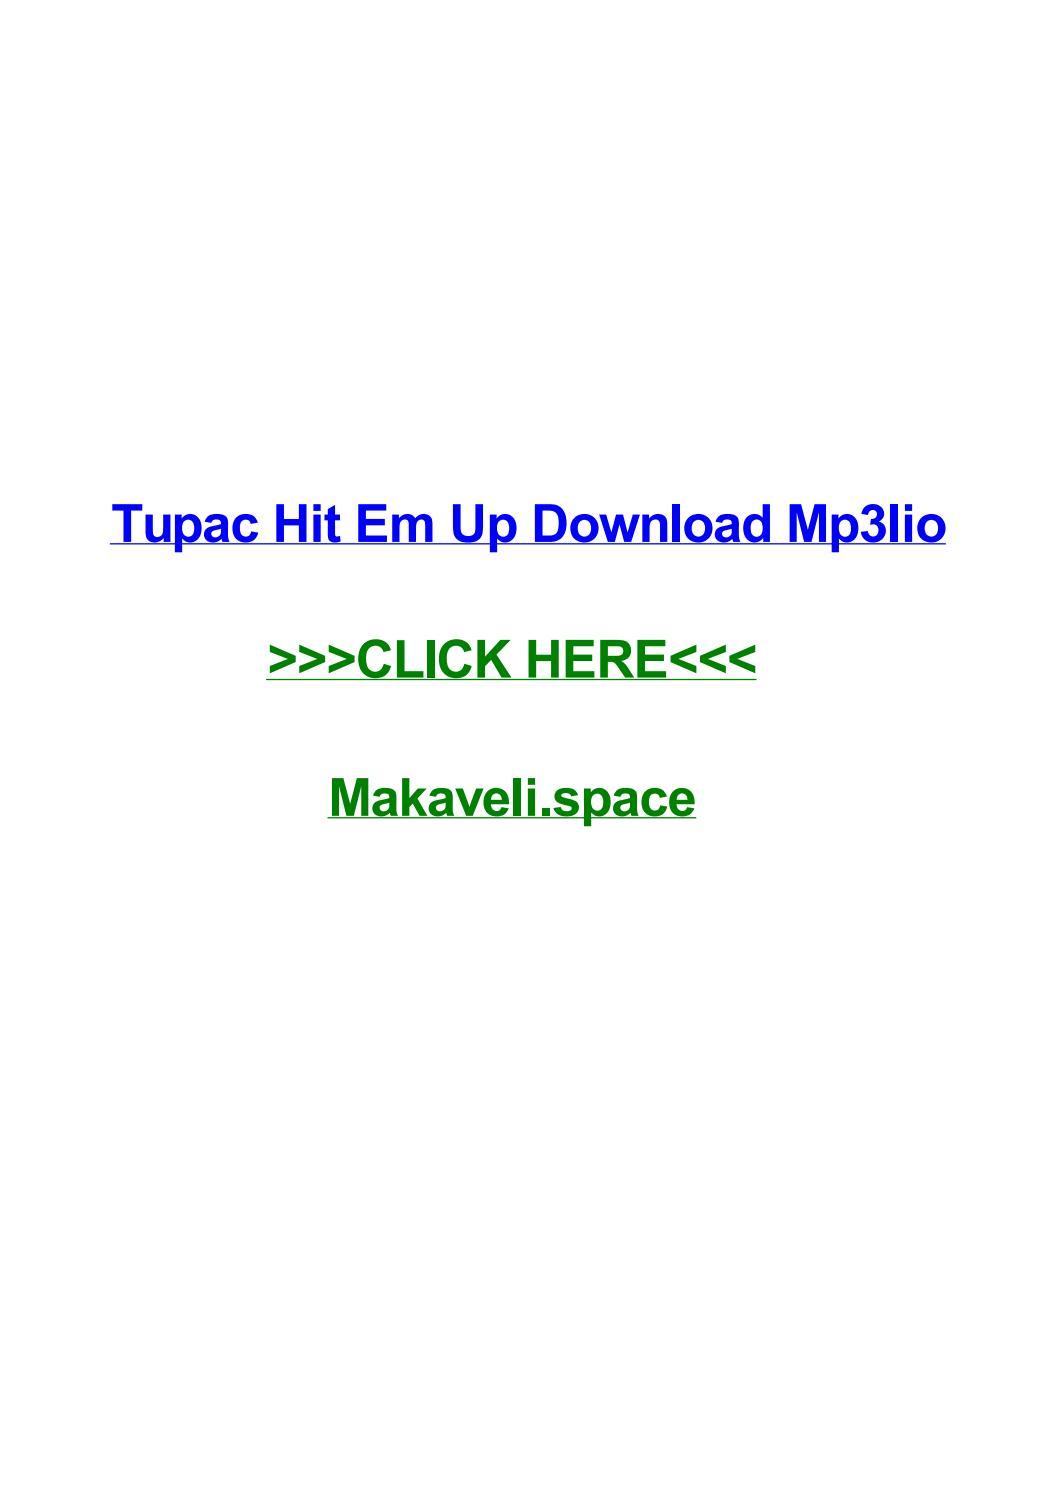 Tupac hit em up download mp3lio by marcushvsgu - issuu